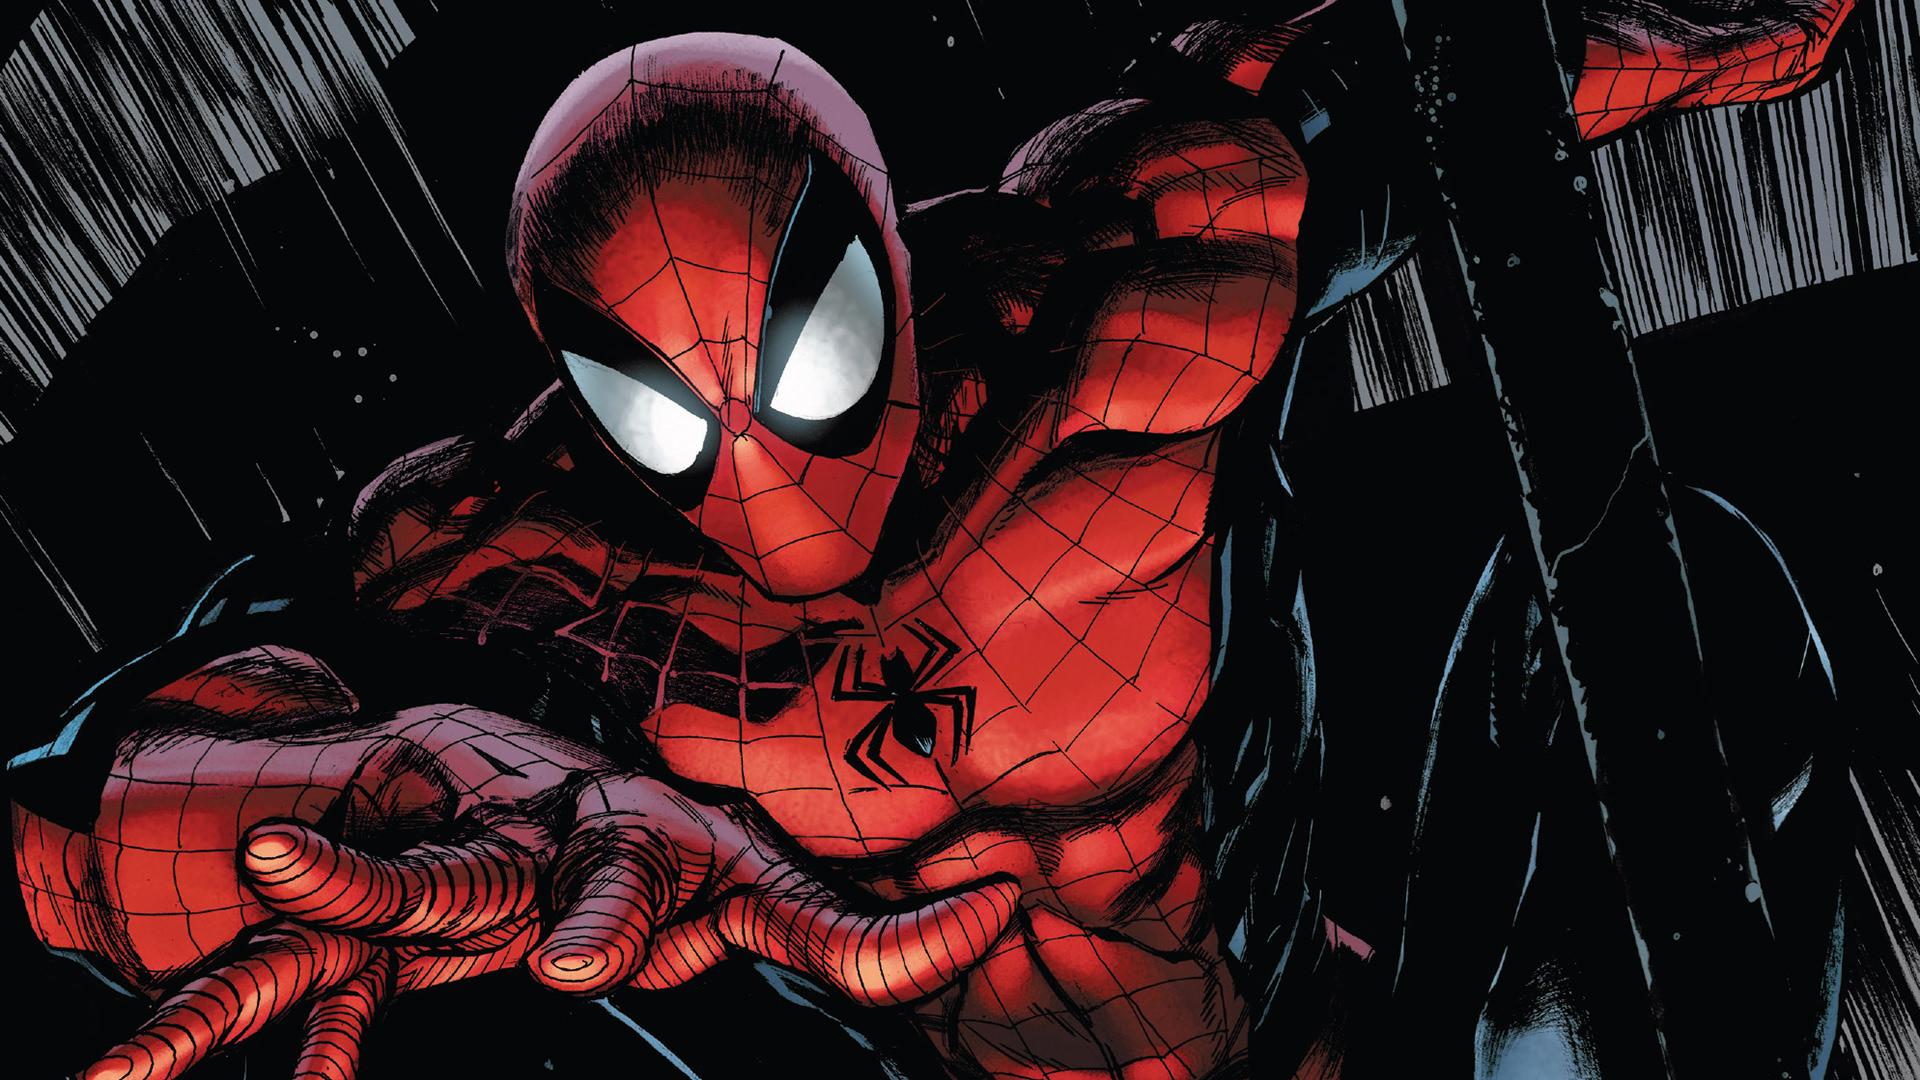 Spiderman Marvel Comics Hd Superheroes 4k Wallpapers Images